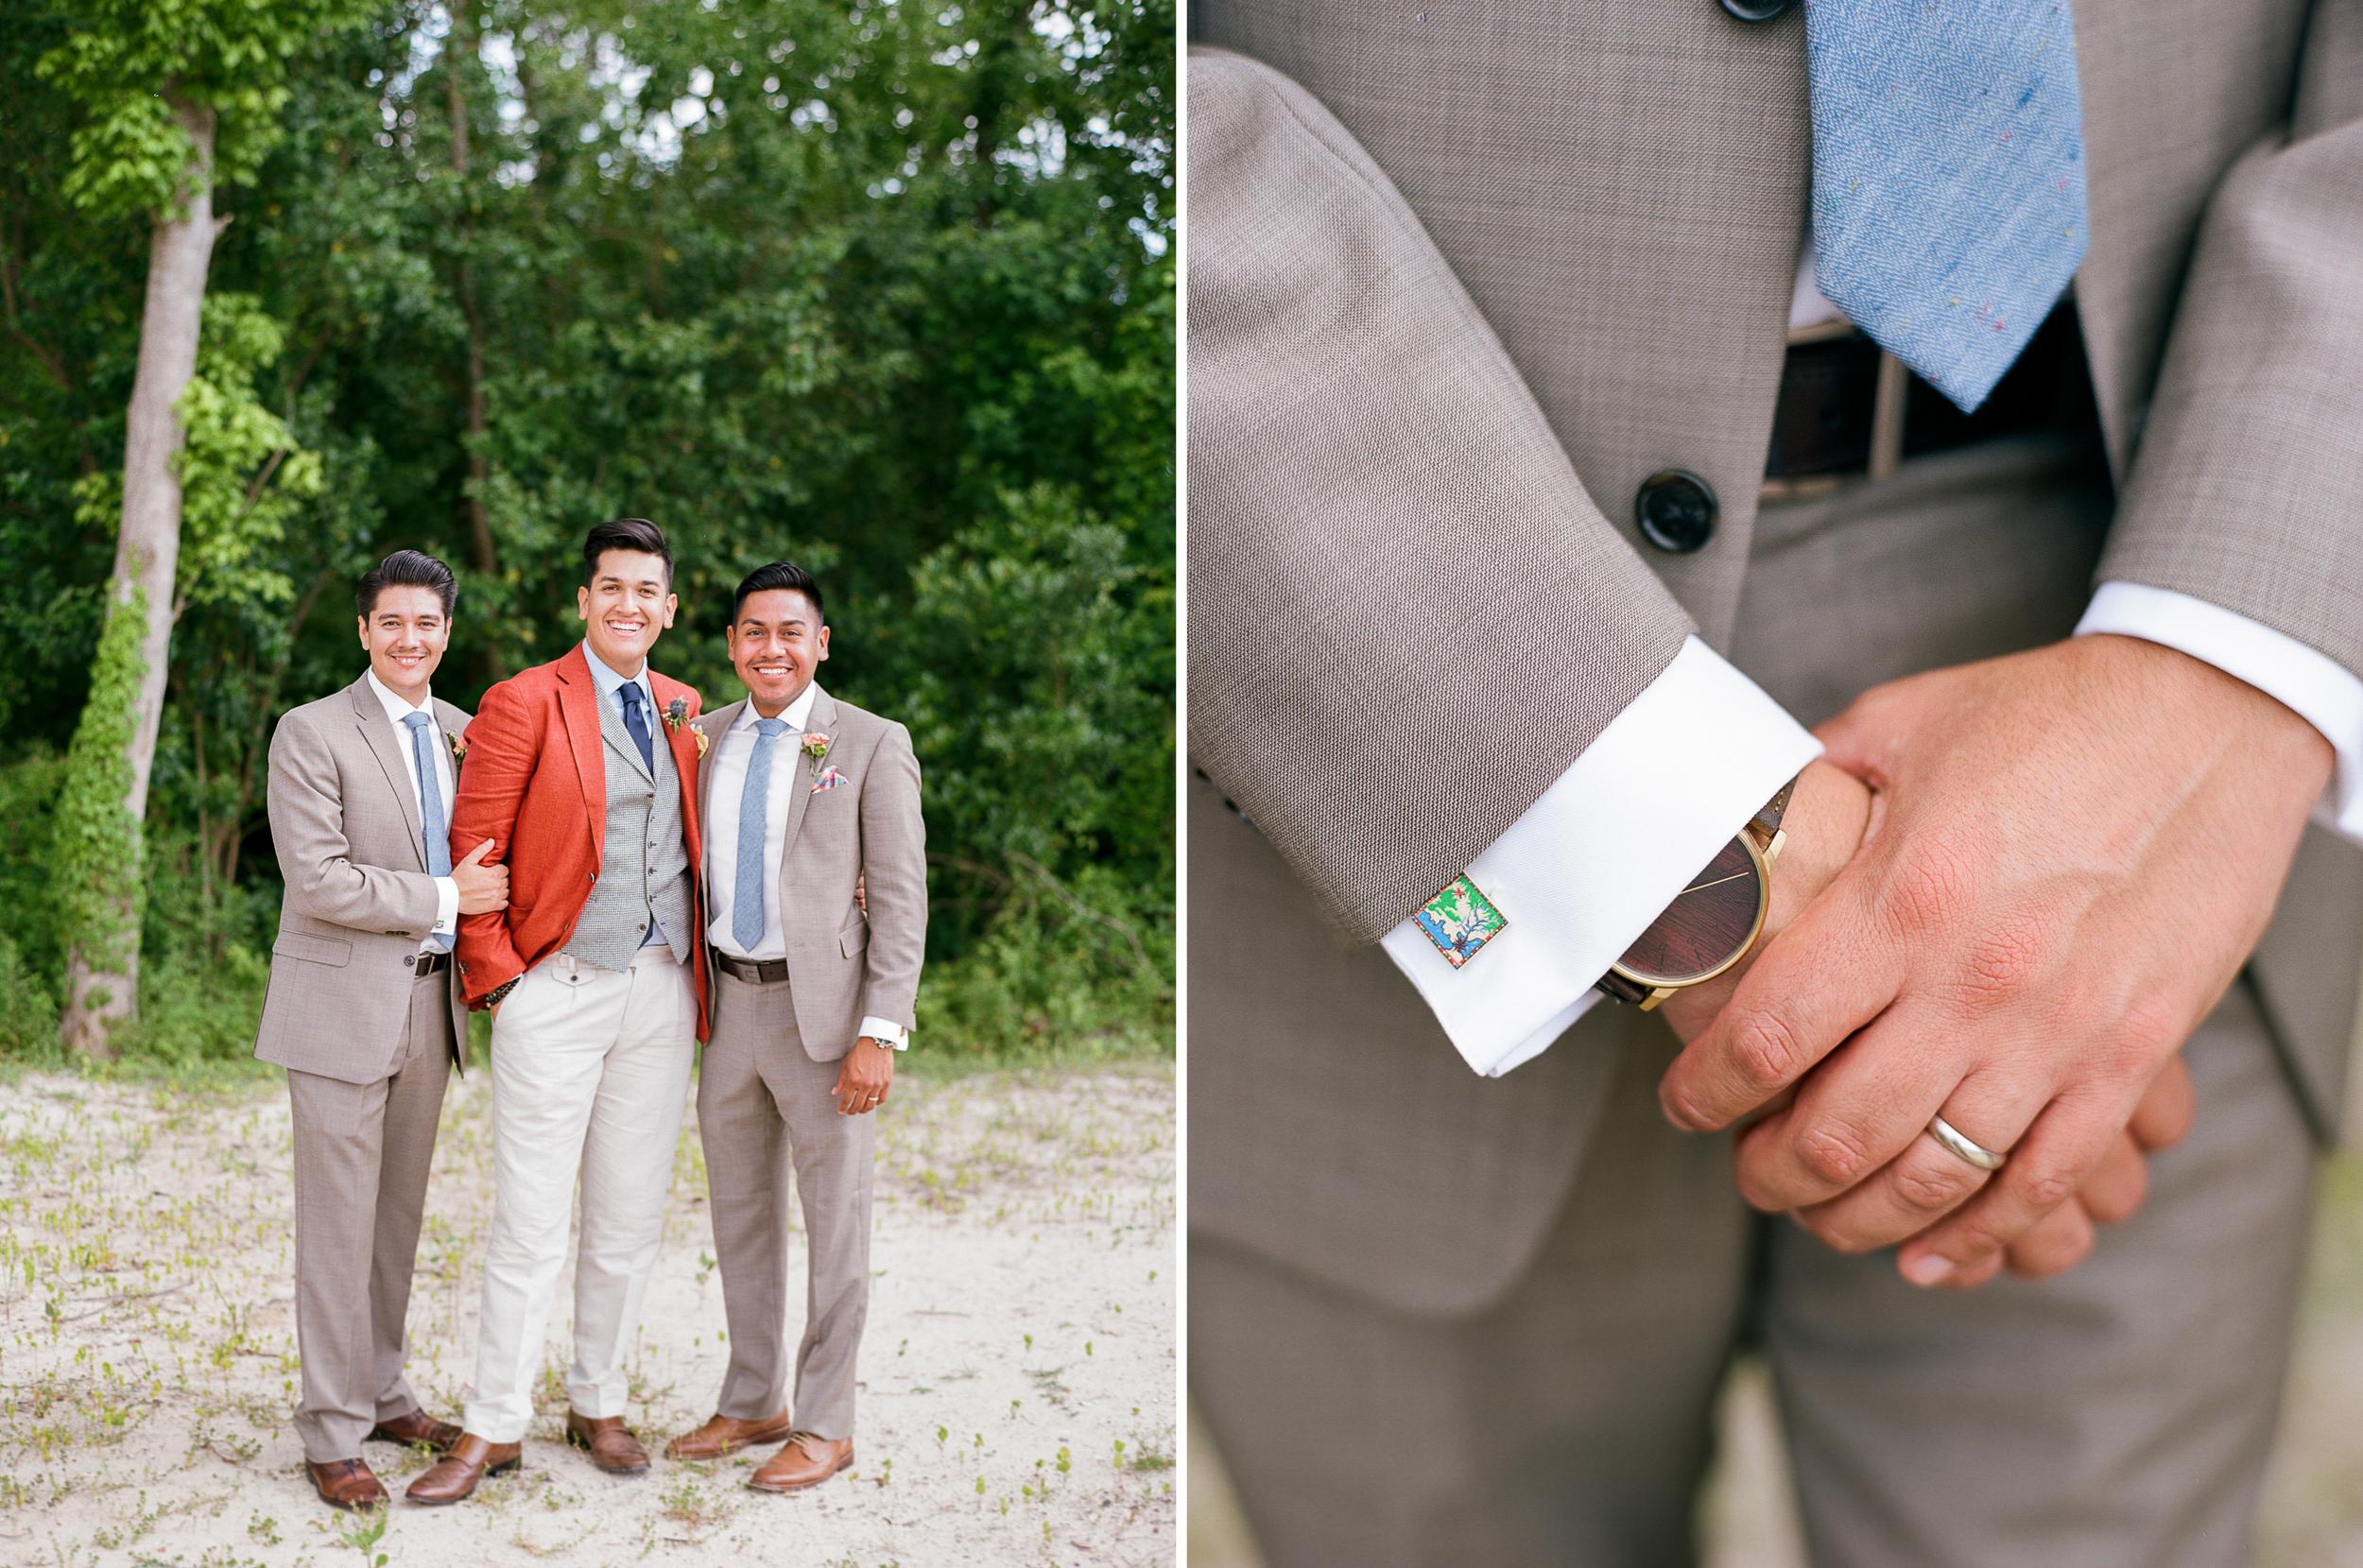 Dana-Fernandez-Photography-Martha-Stewart-Weddings-Houston-Texas-Wedding-Photographer-Film-113.jpg